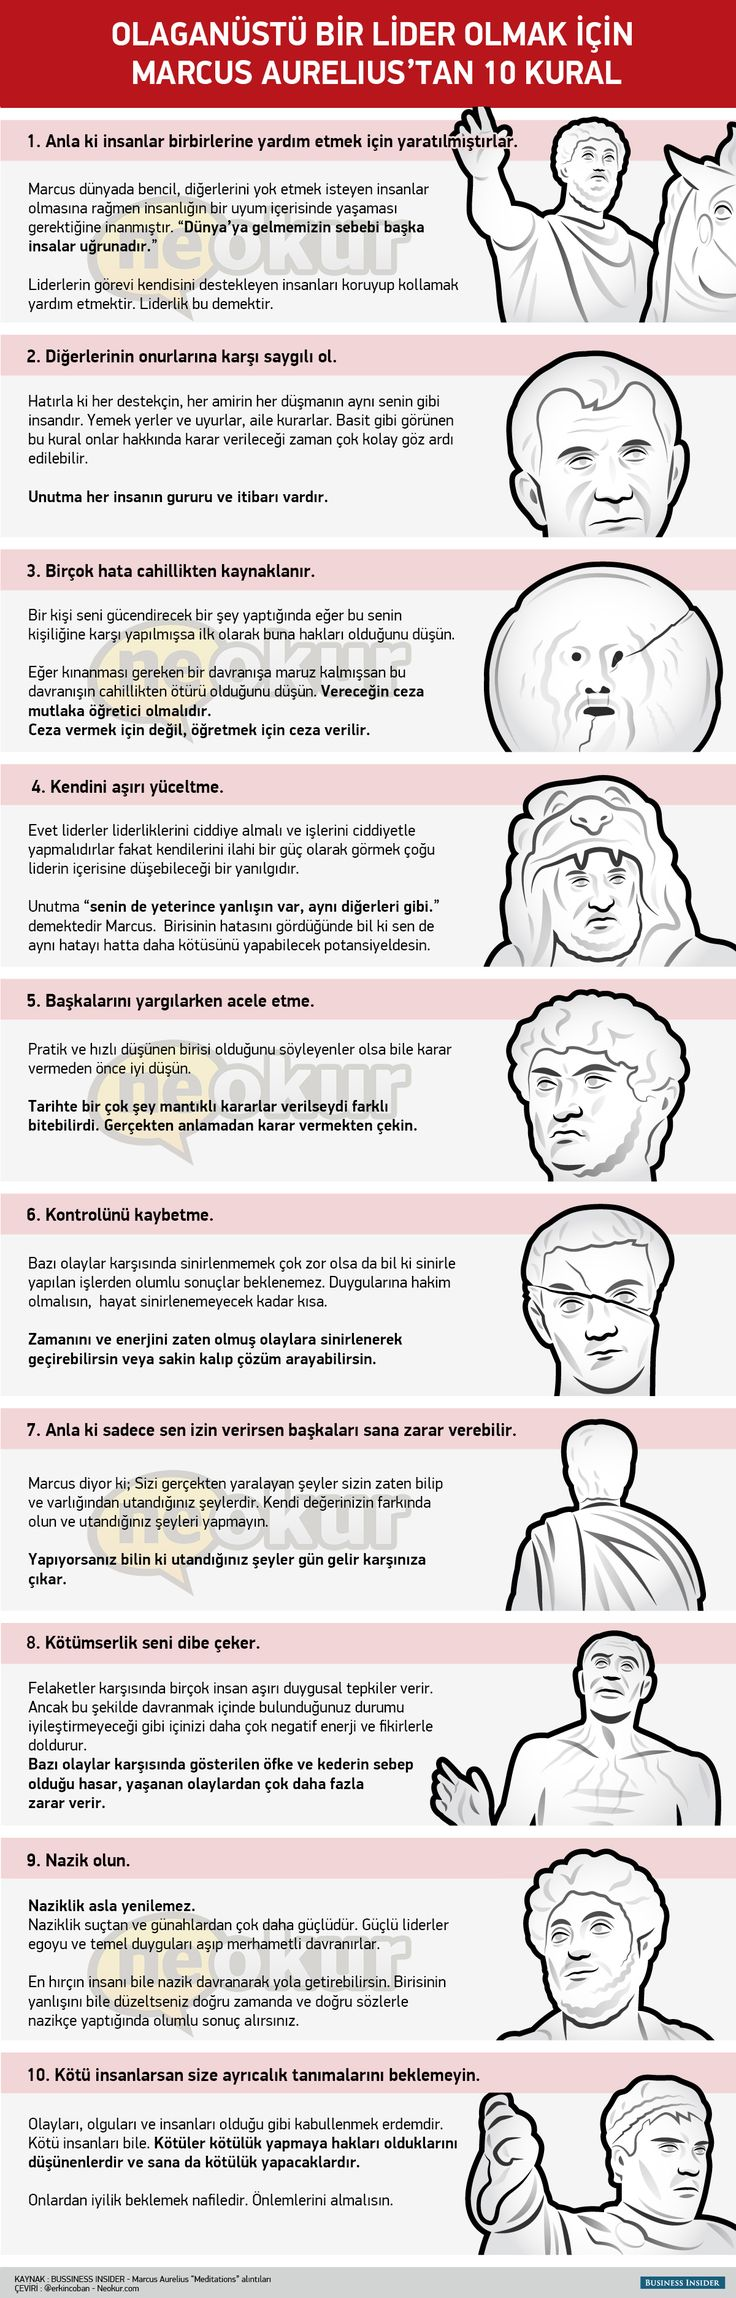 Roma imparatoru Marcus Aurelius'un 10 Liderlik Kuralı